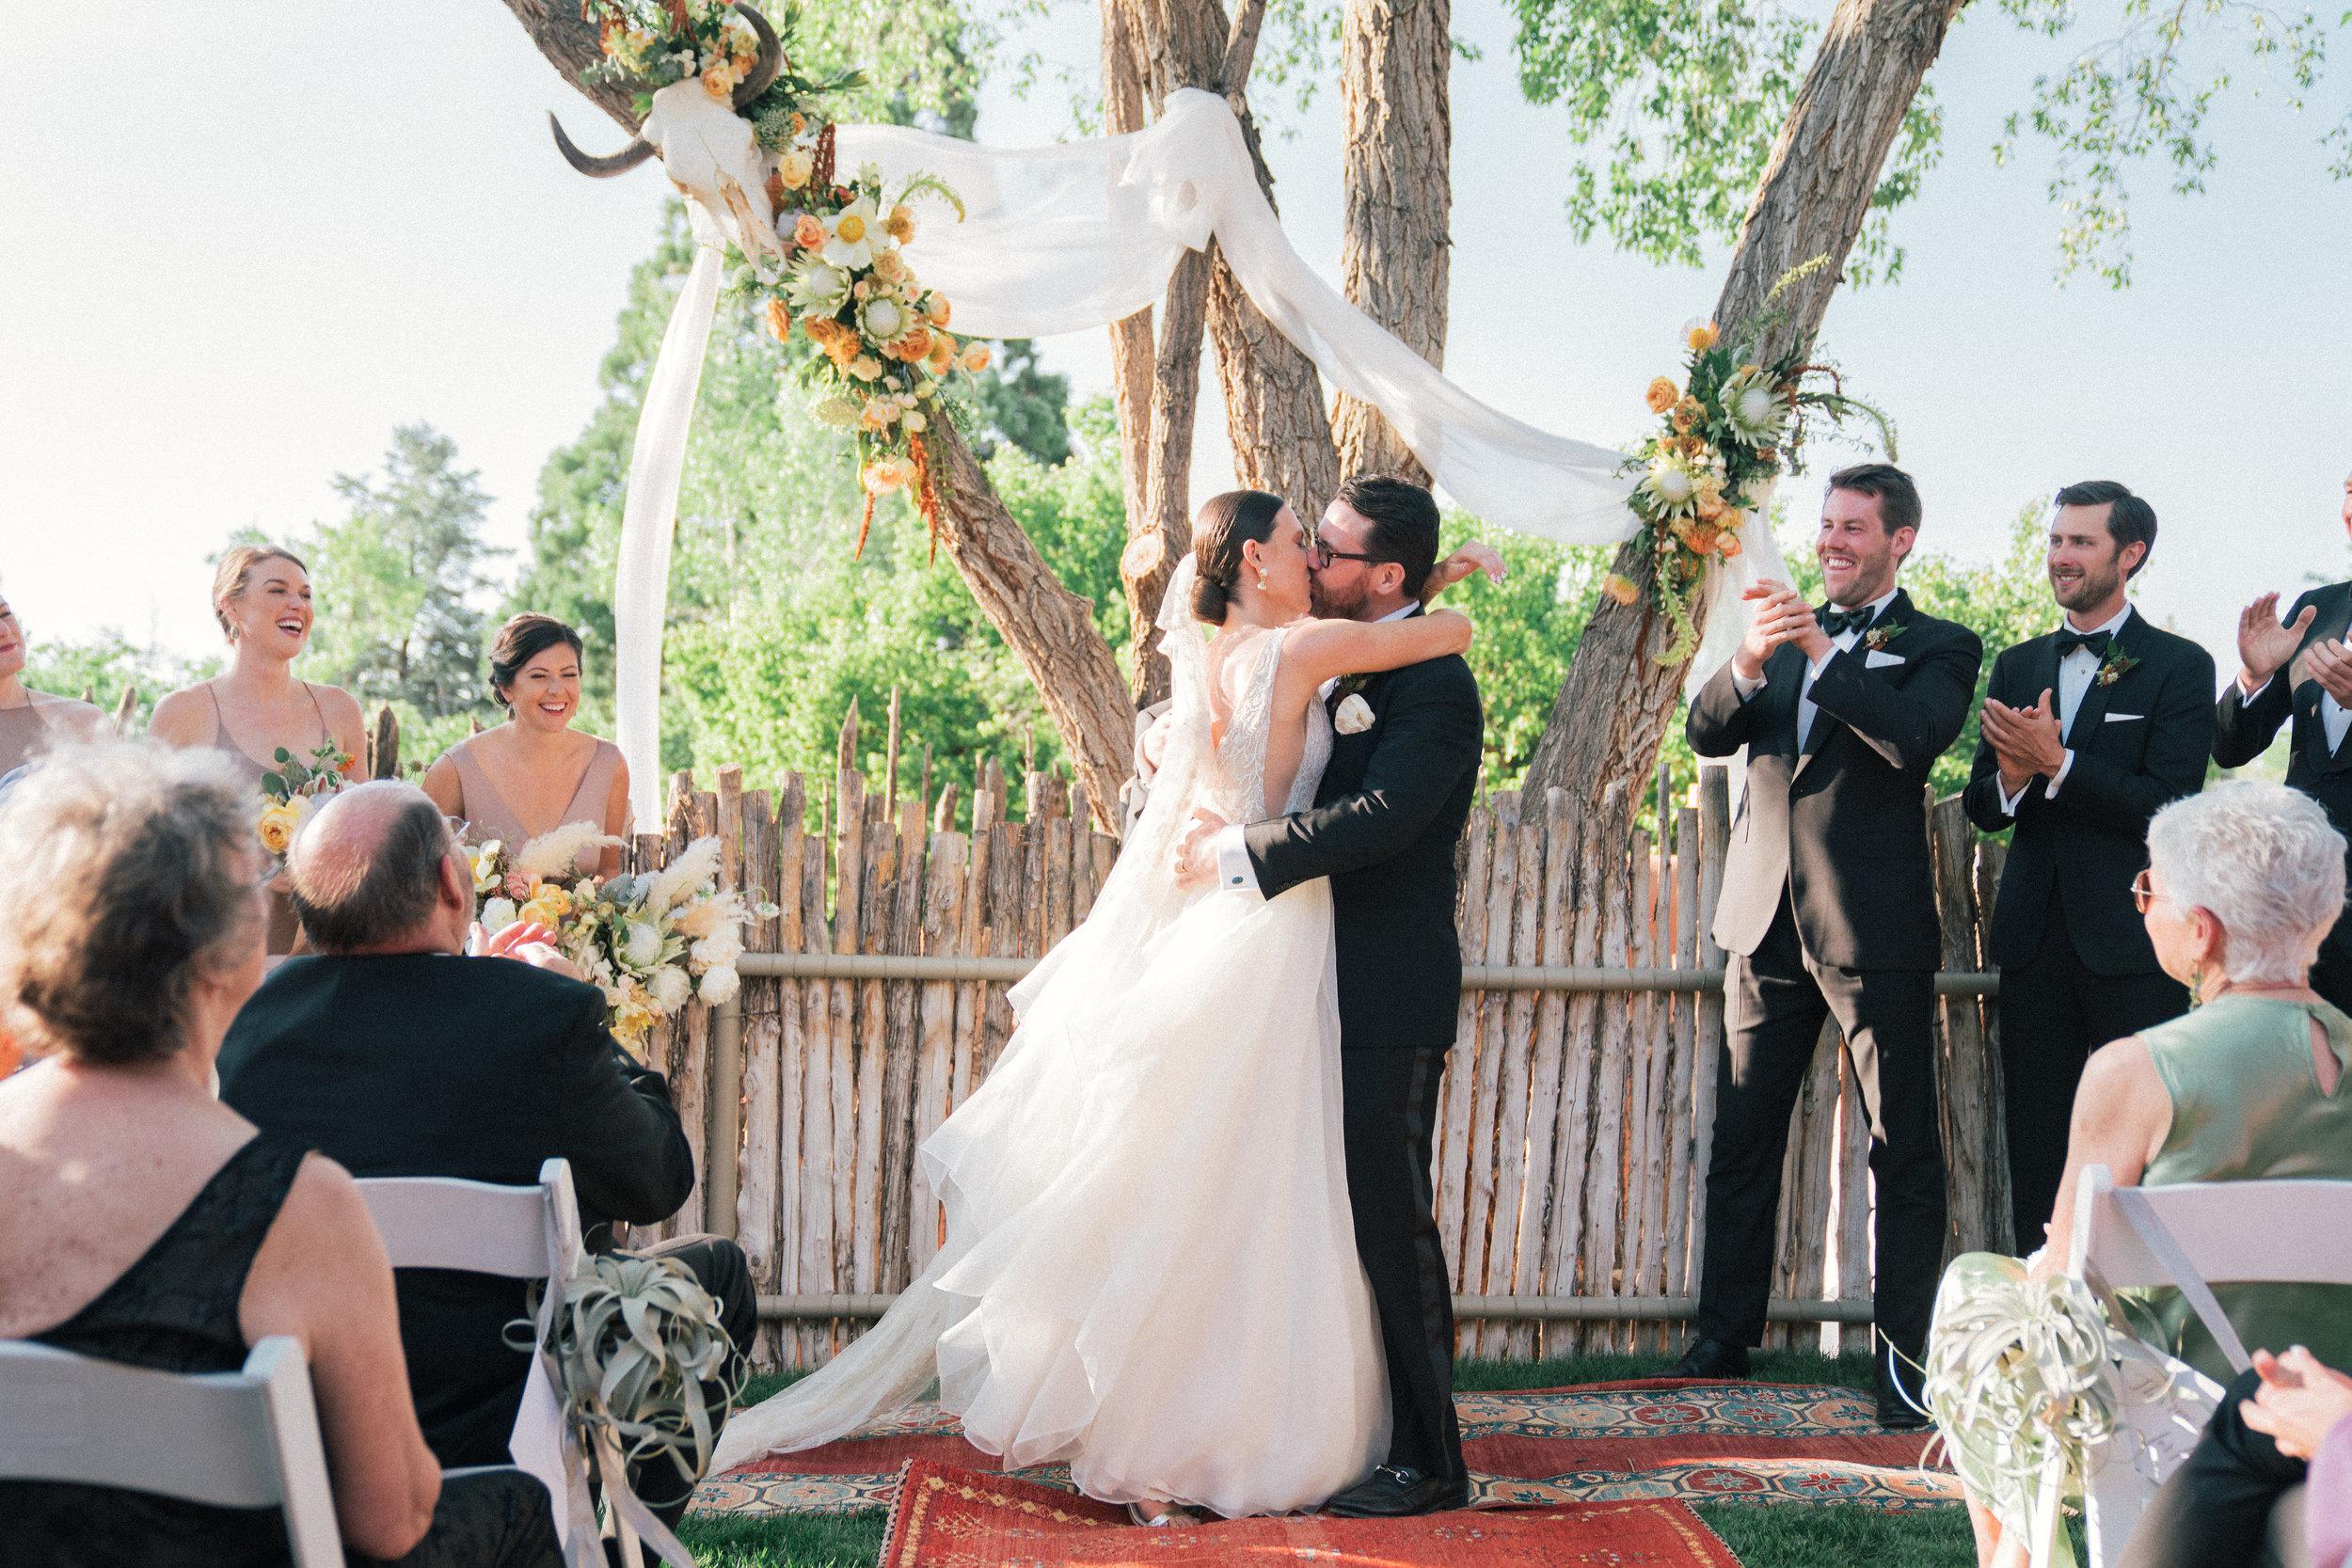 landry_lovelace_wedding_jbobephoto-508.jpg